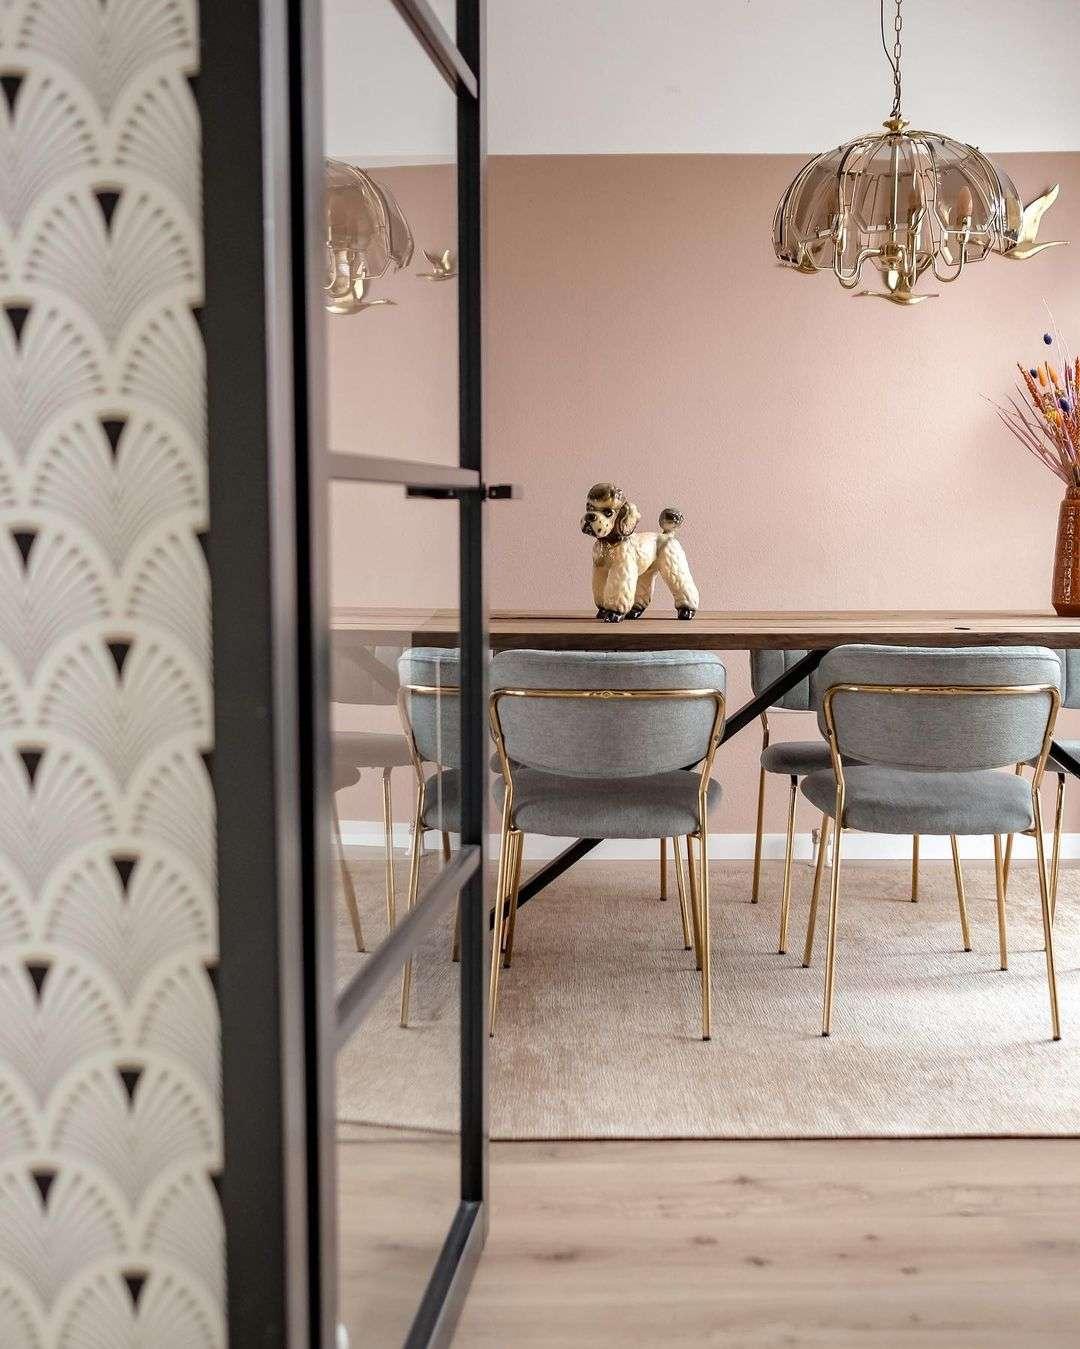 vintage interieur, vintage items, roze bank, wonen in de regio